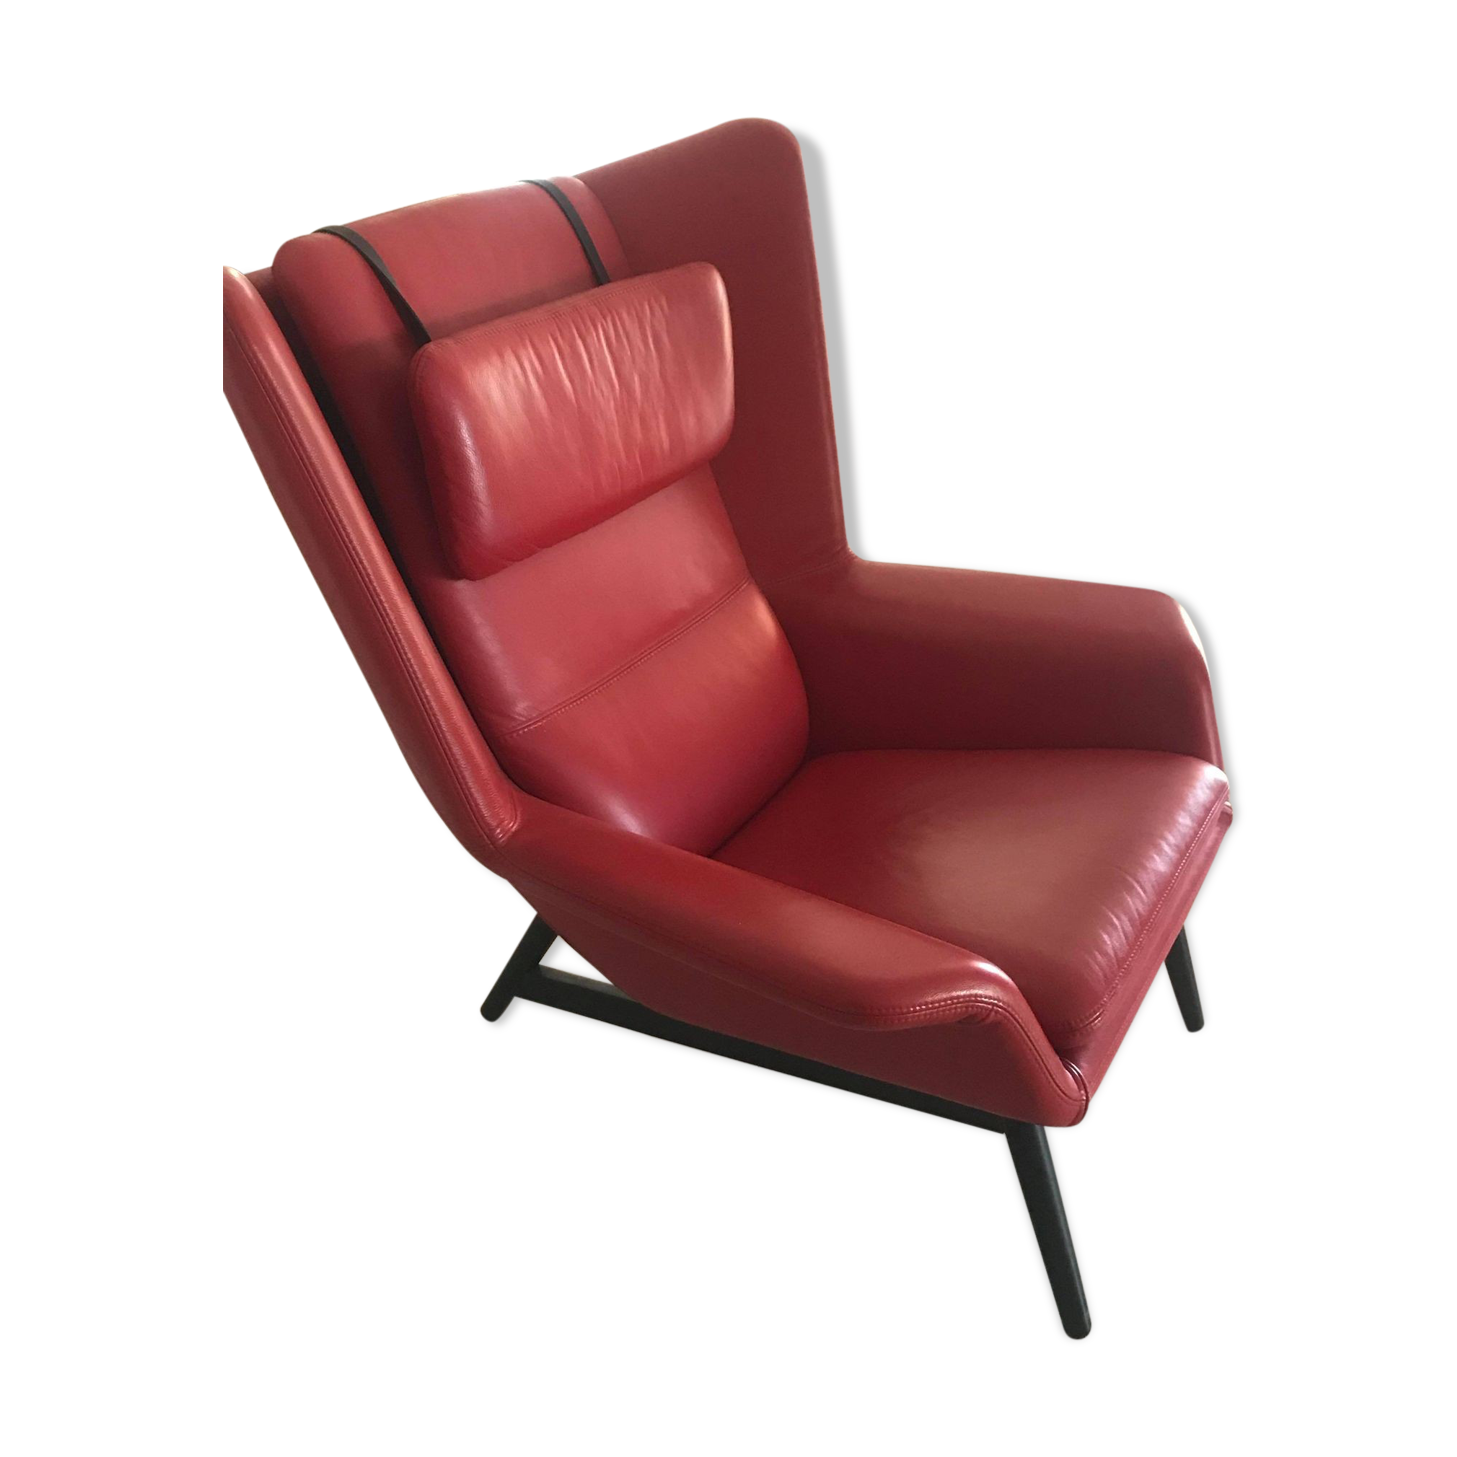 Fauteuil cuir rouge design